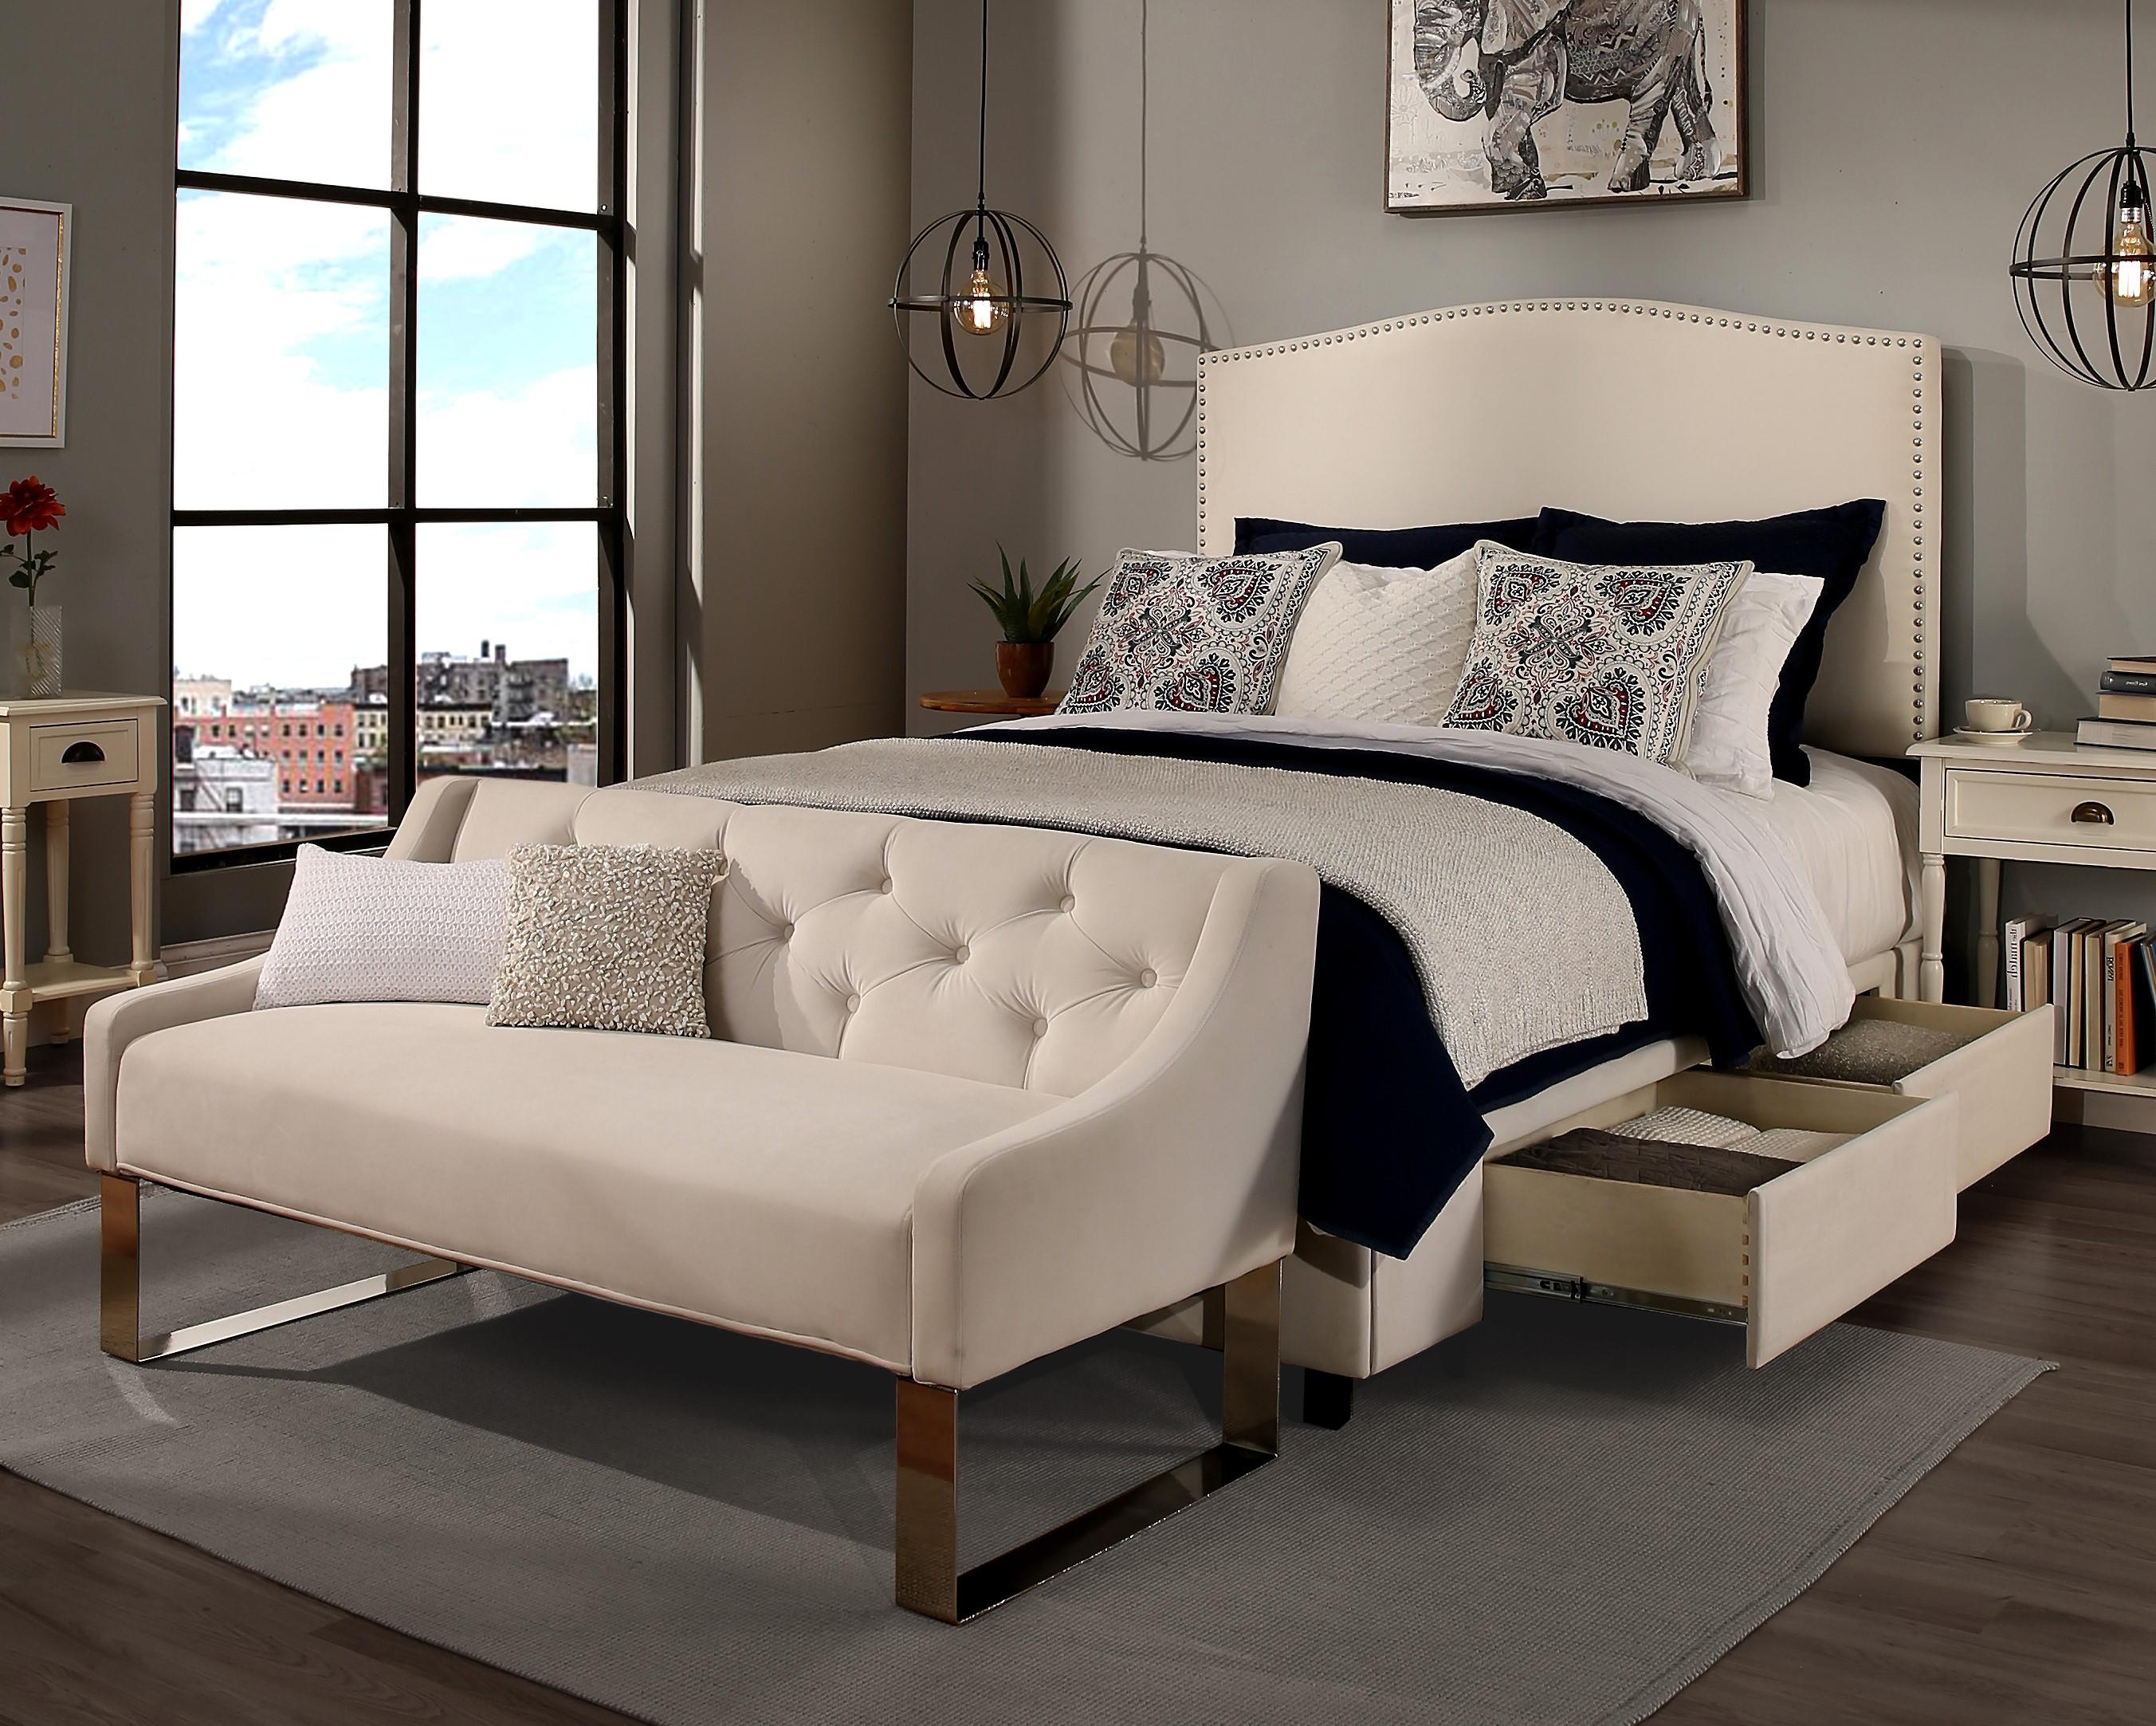 Ivory Newport Storage & sofa (30441-B-S,30442-B-S)